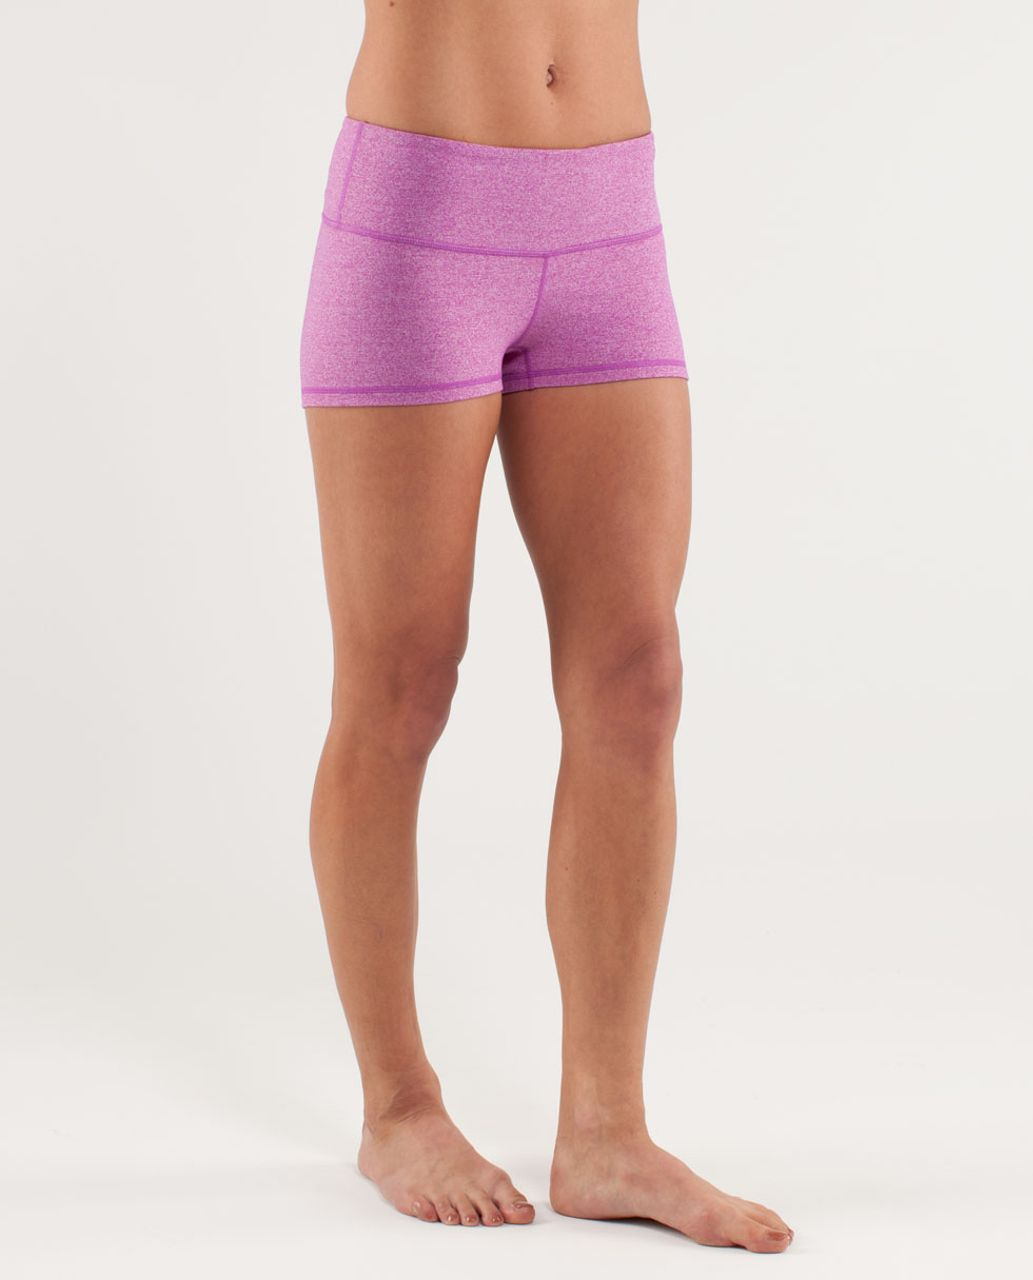 Lululemon Boogie Short - Heathered Ultra Violet